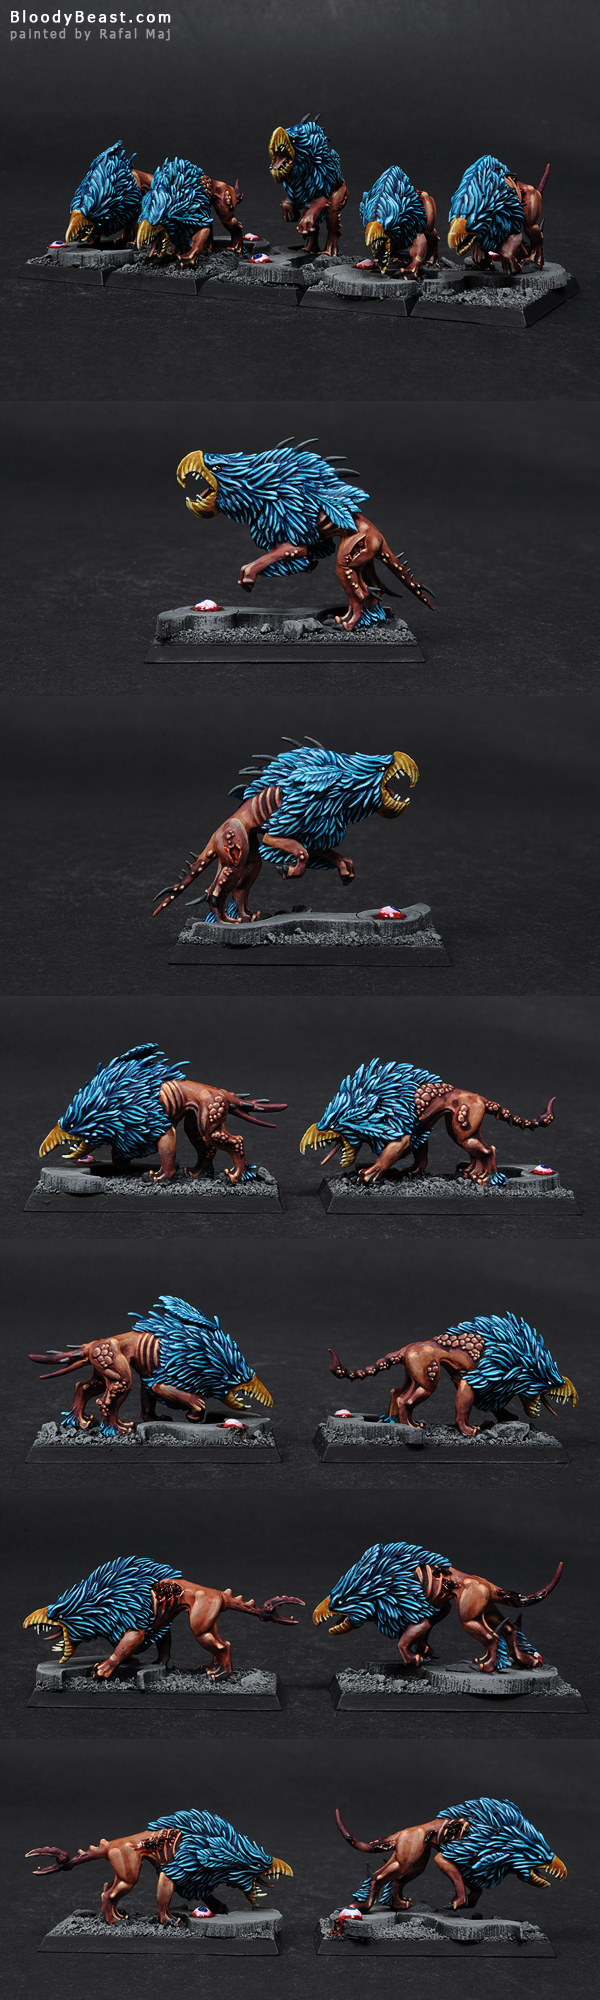 Chaos Warhounds of Tzeentch Closeups Painted by Rafal Maj (BloodyBeast.com)